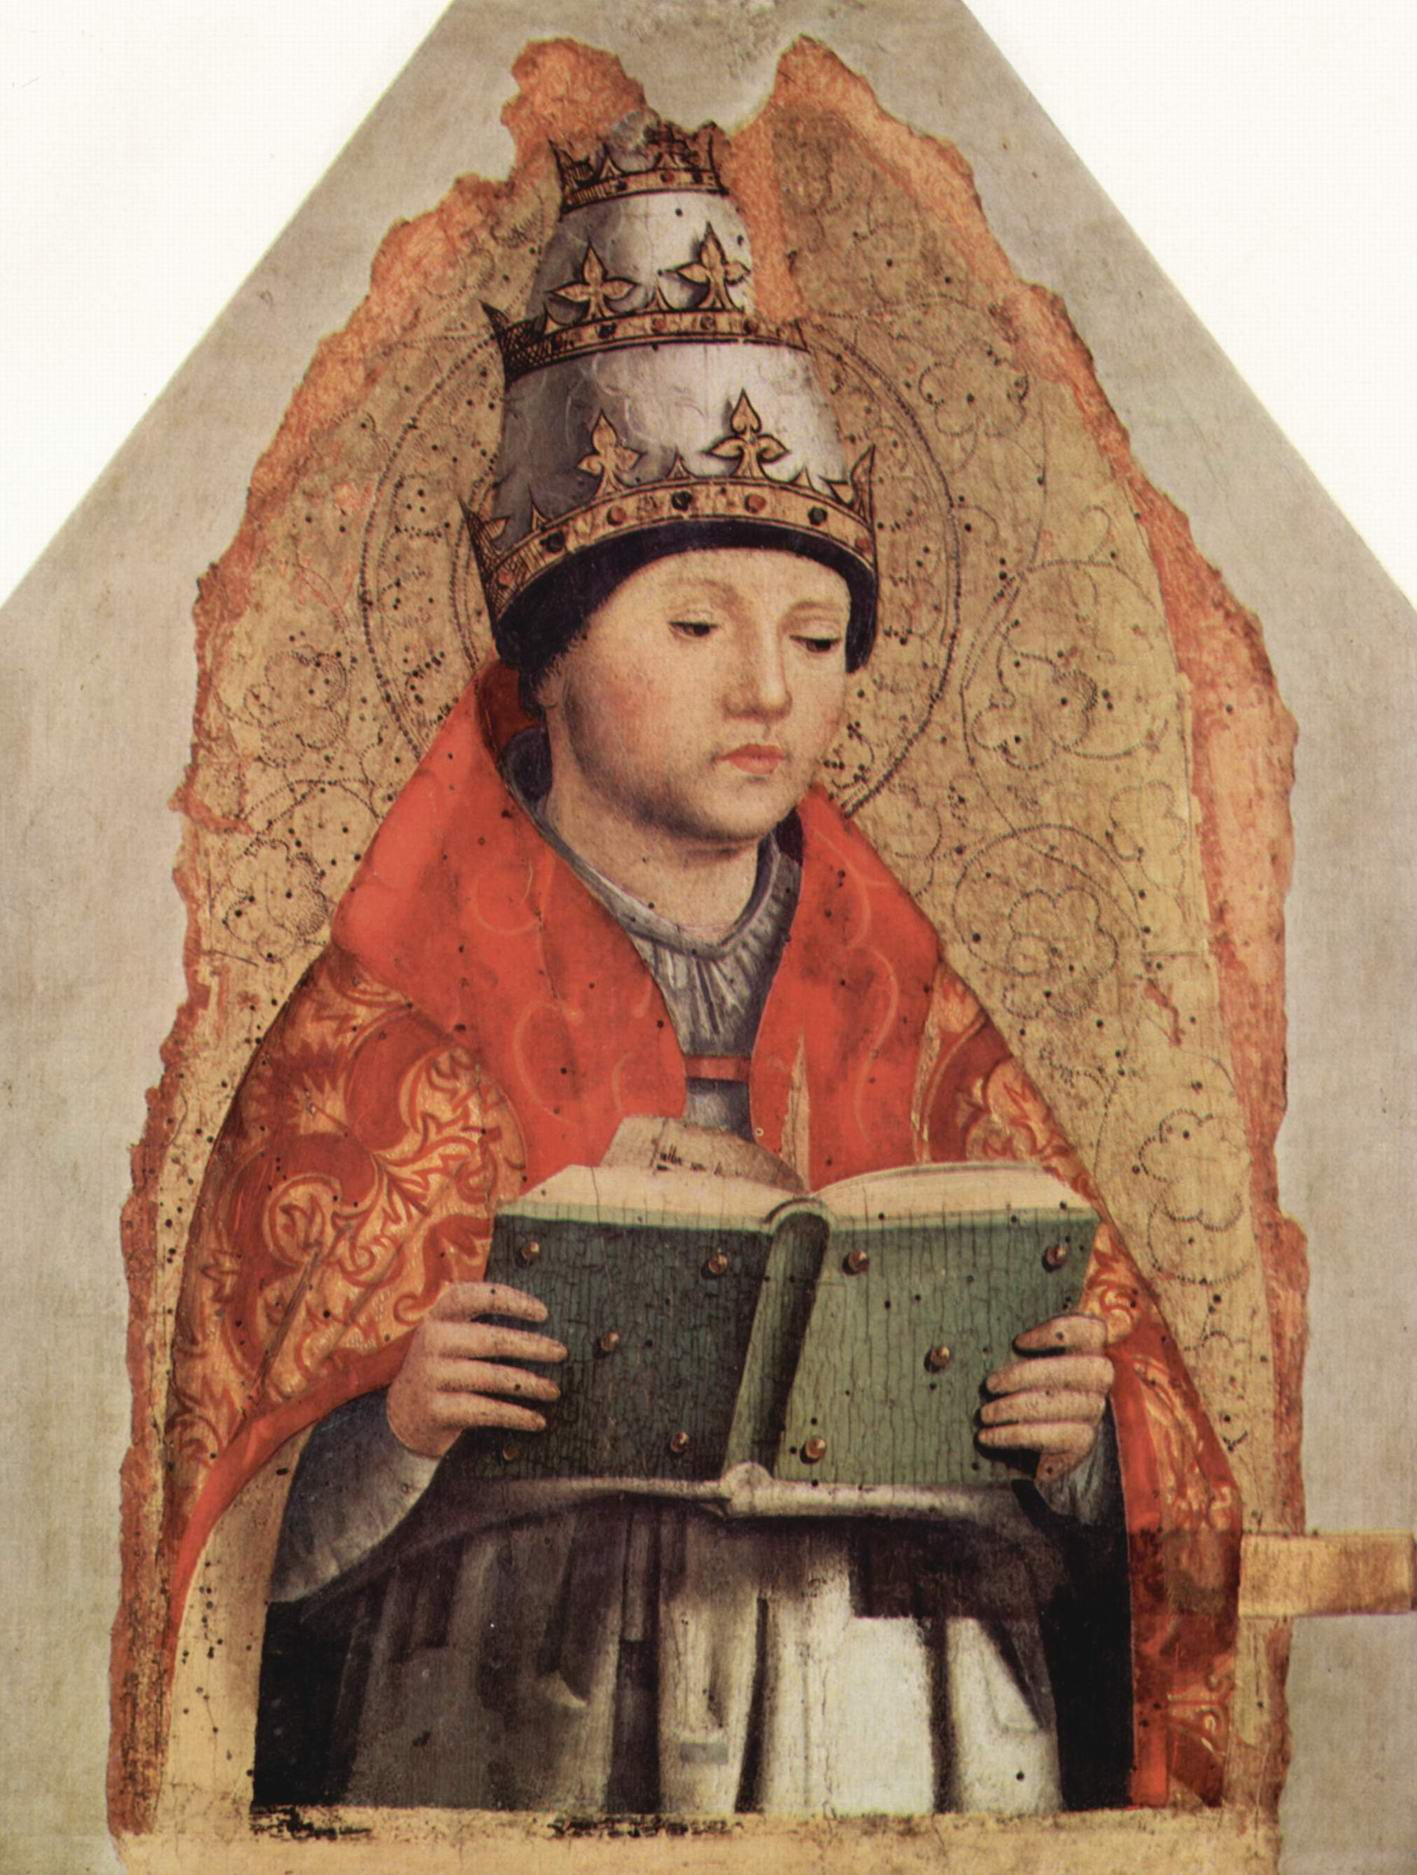 Св. Григорий, Антонелло да Мессина